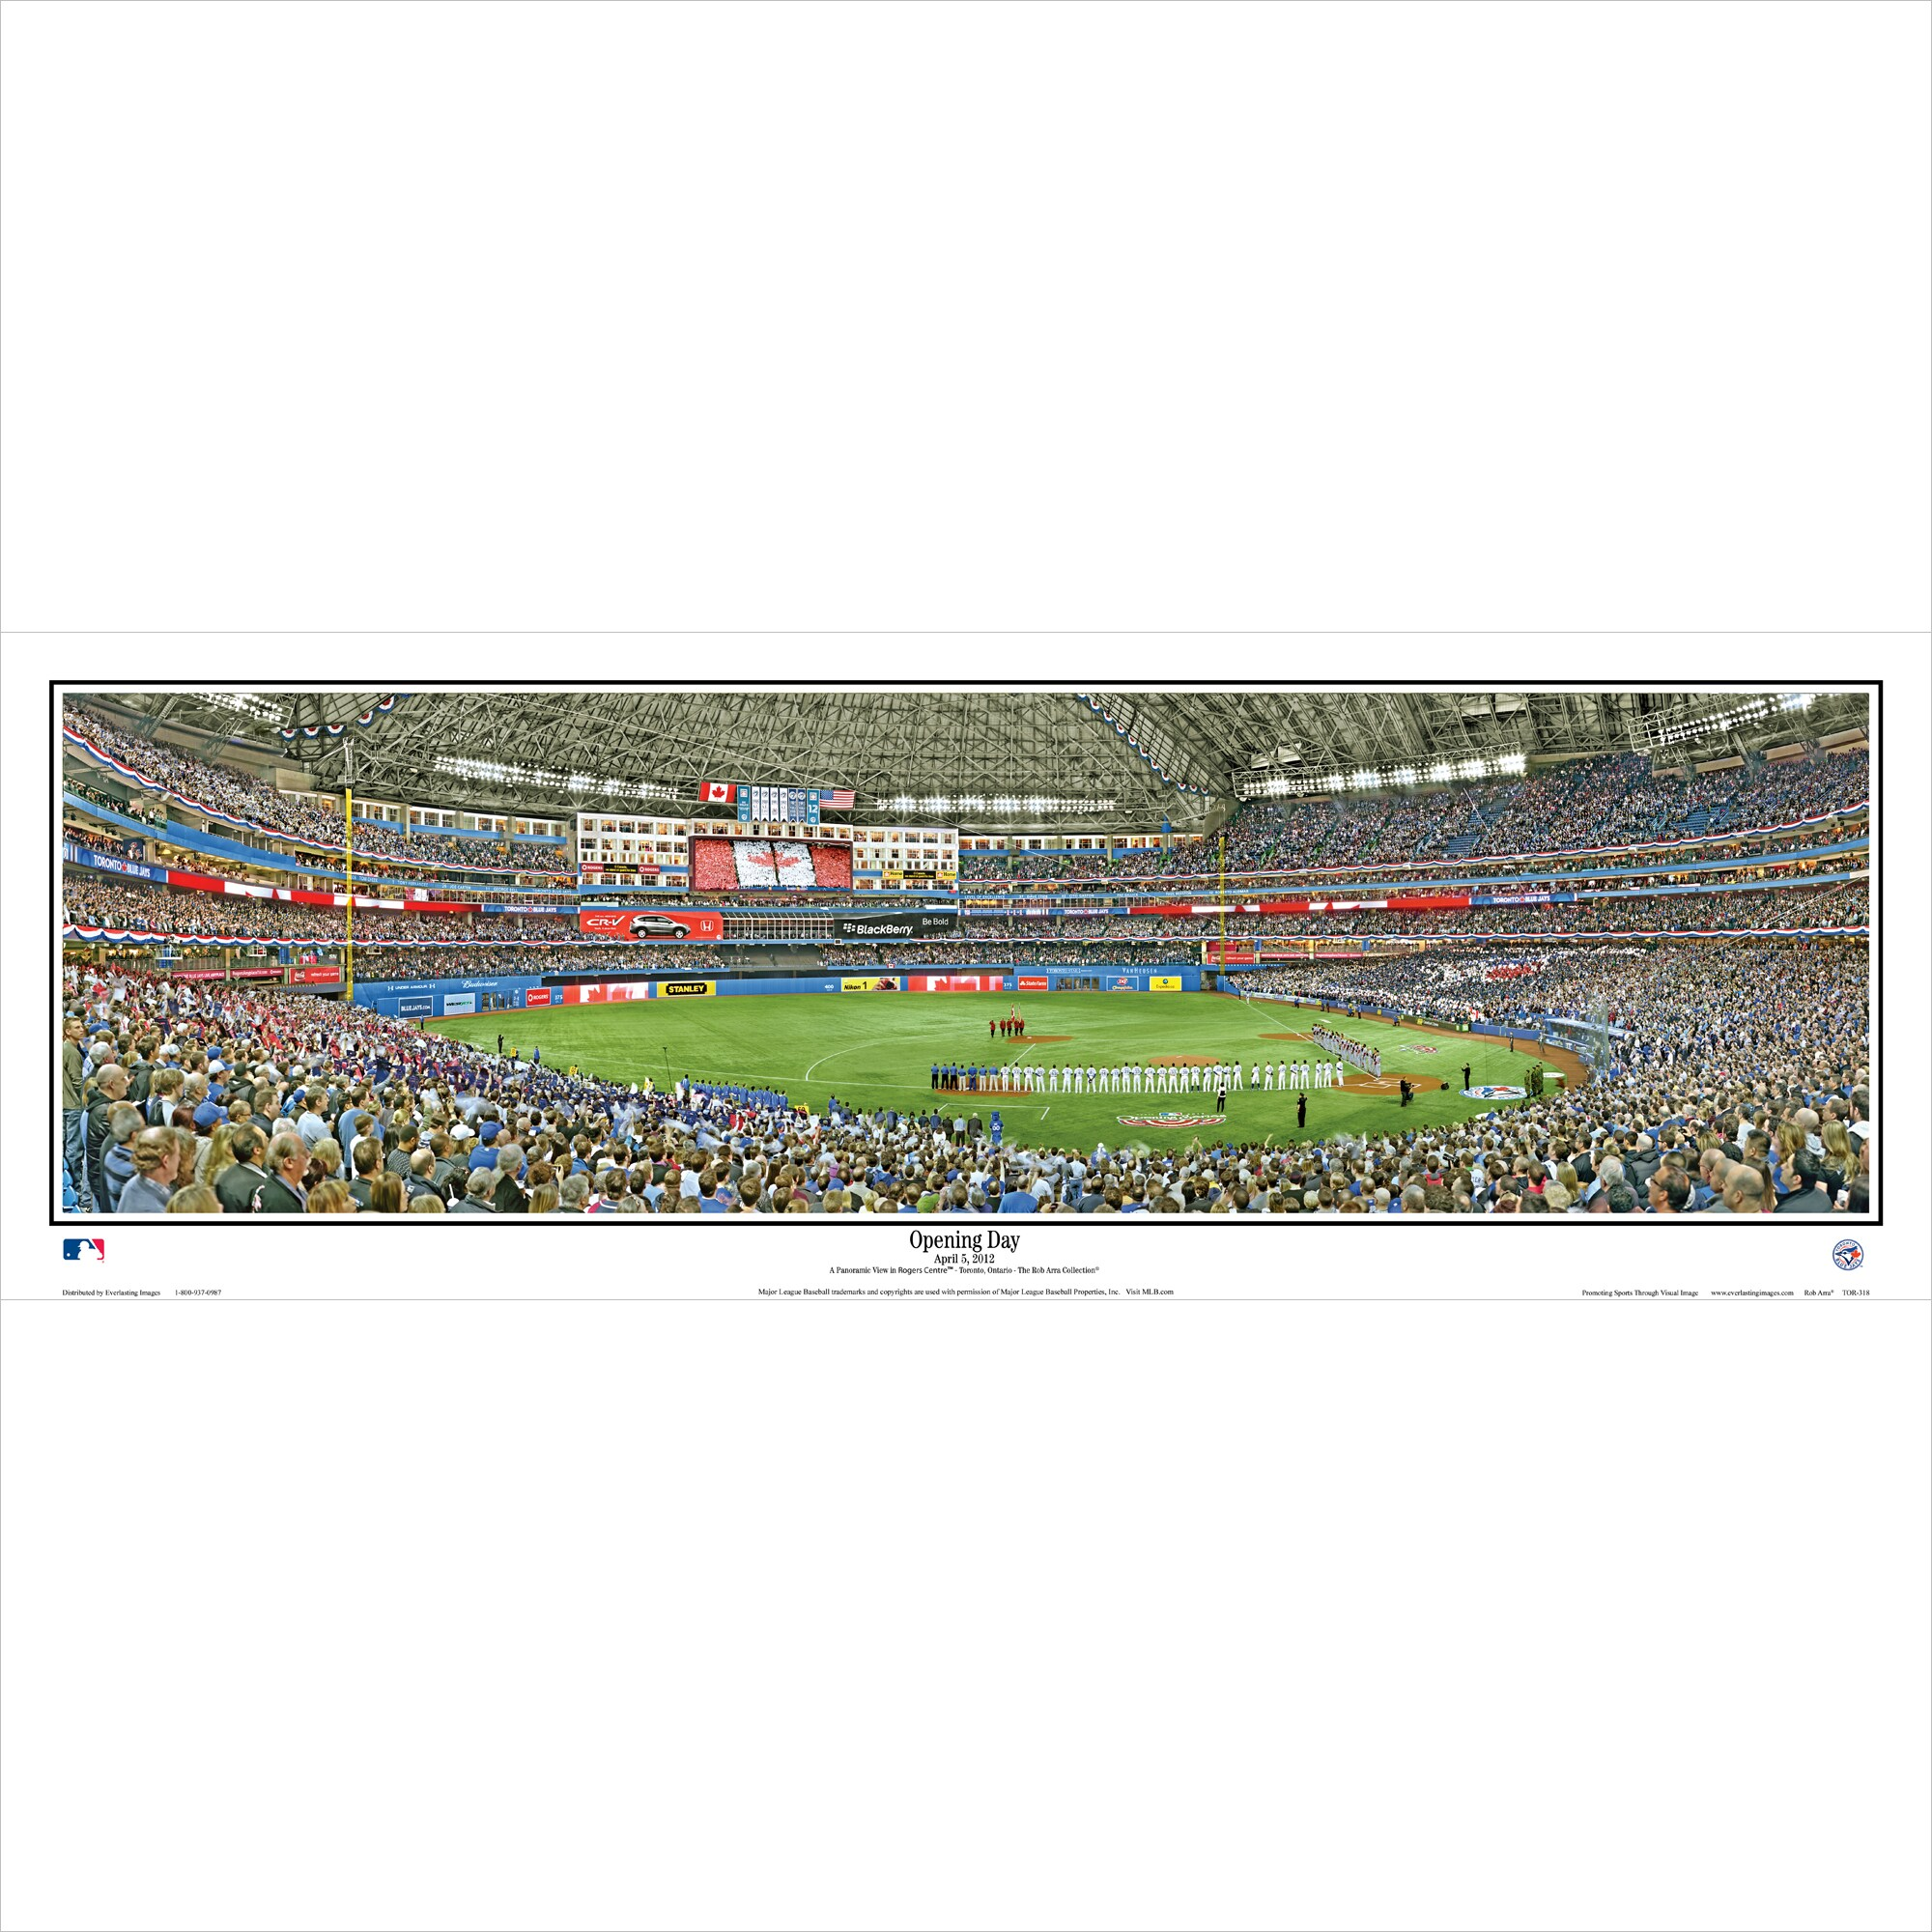 "Toronto Blue Jays 39"" x 13.5"" Opening Day Standard Black Framed Panoramic"